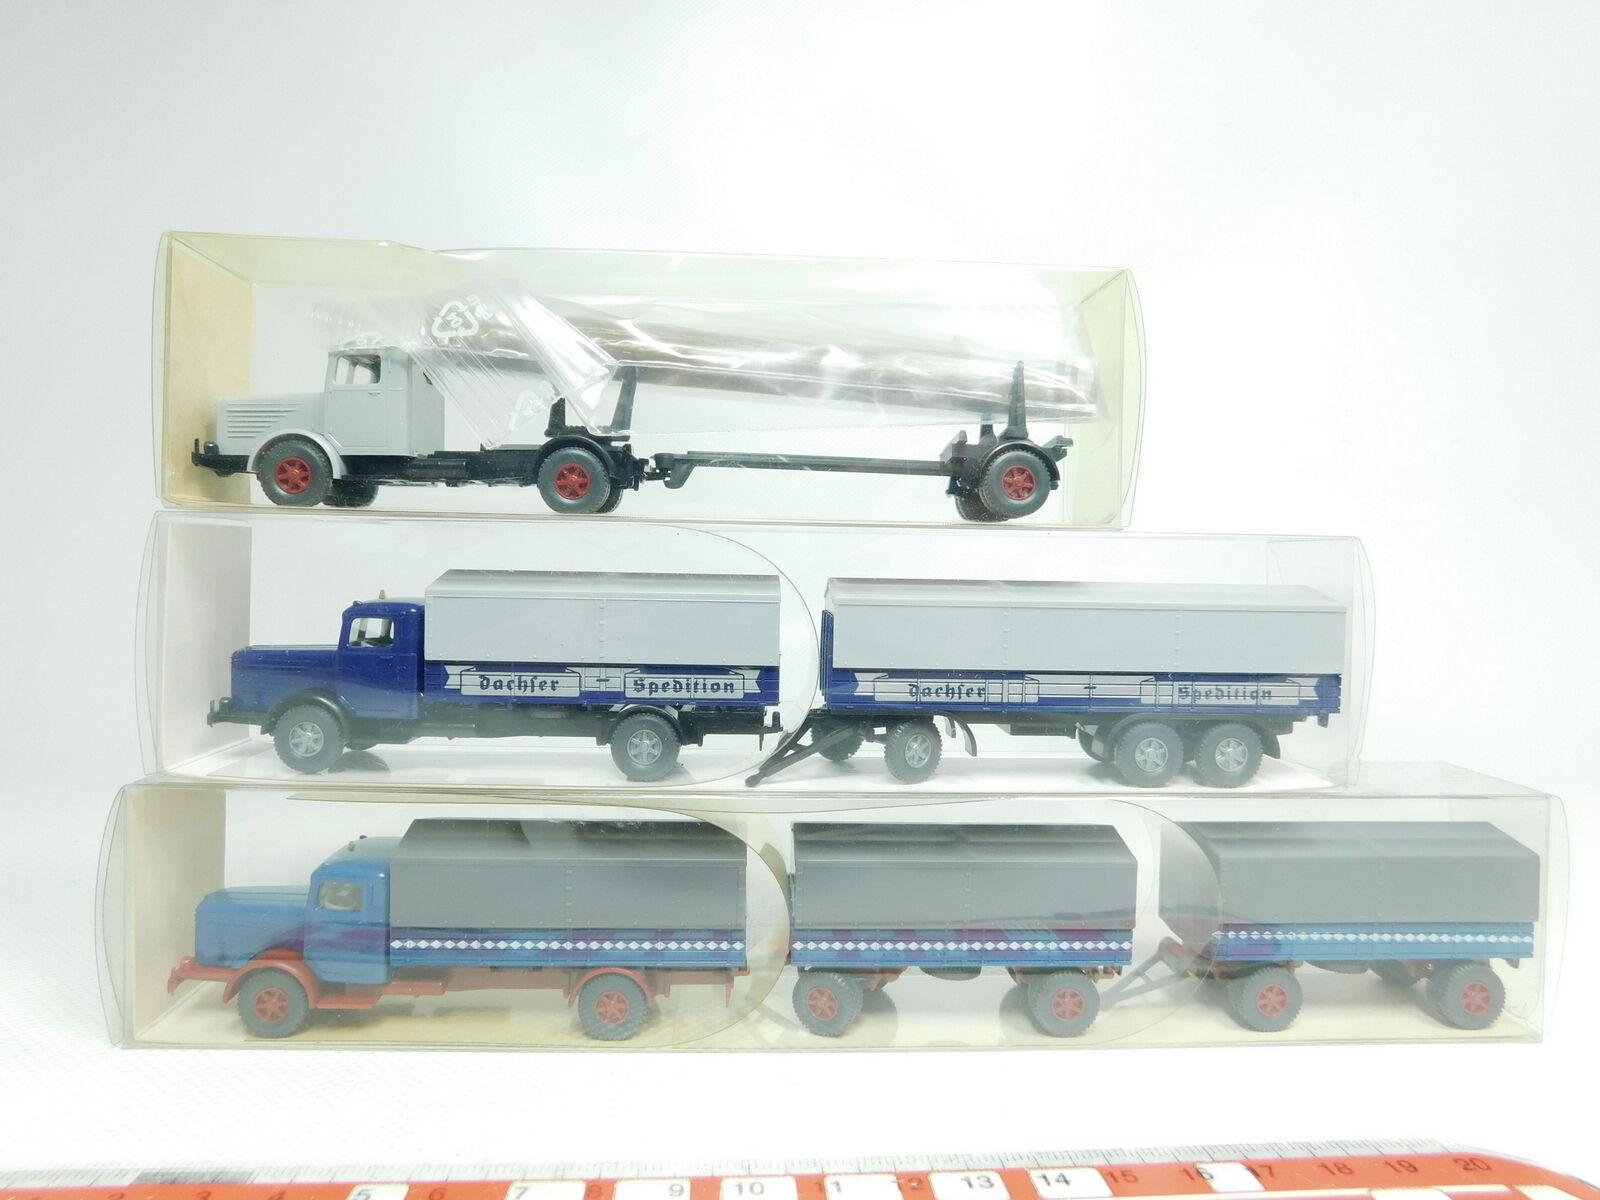 BJ488-0,5x Wiking H0 1 1 1 87 LKW Büssing  478 + 858 Dachser + 839, NEUW+OVP bd2971